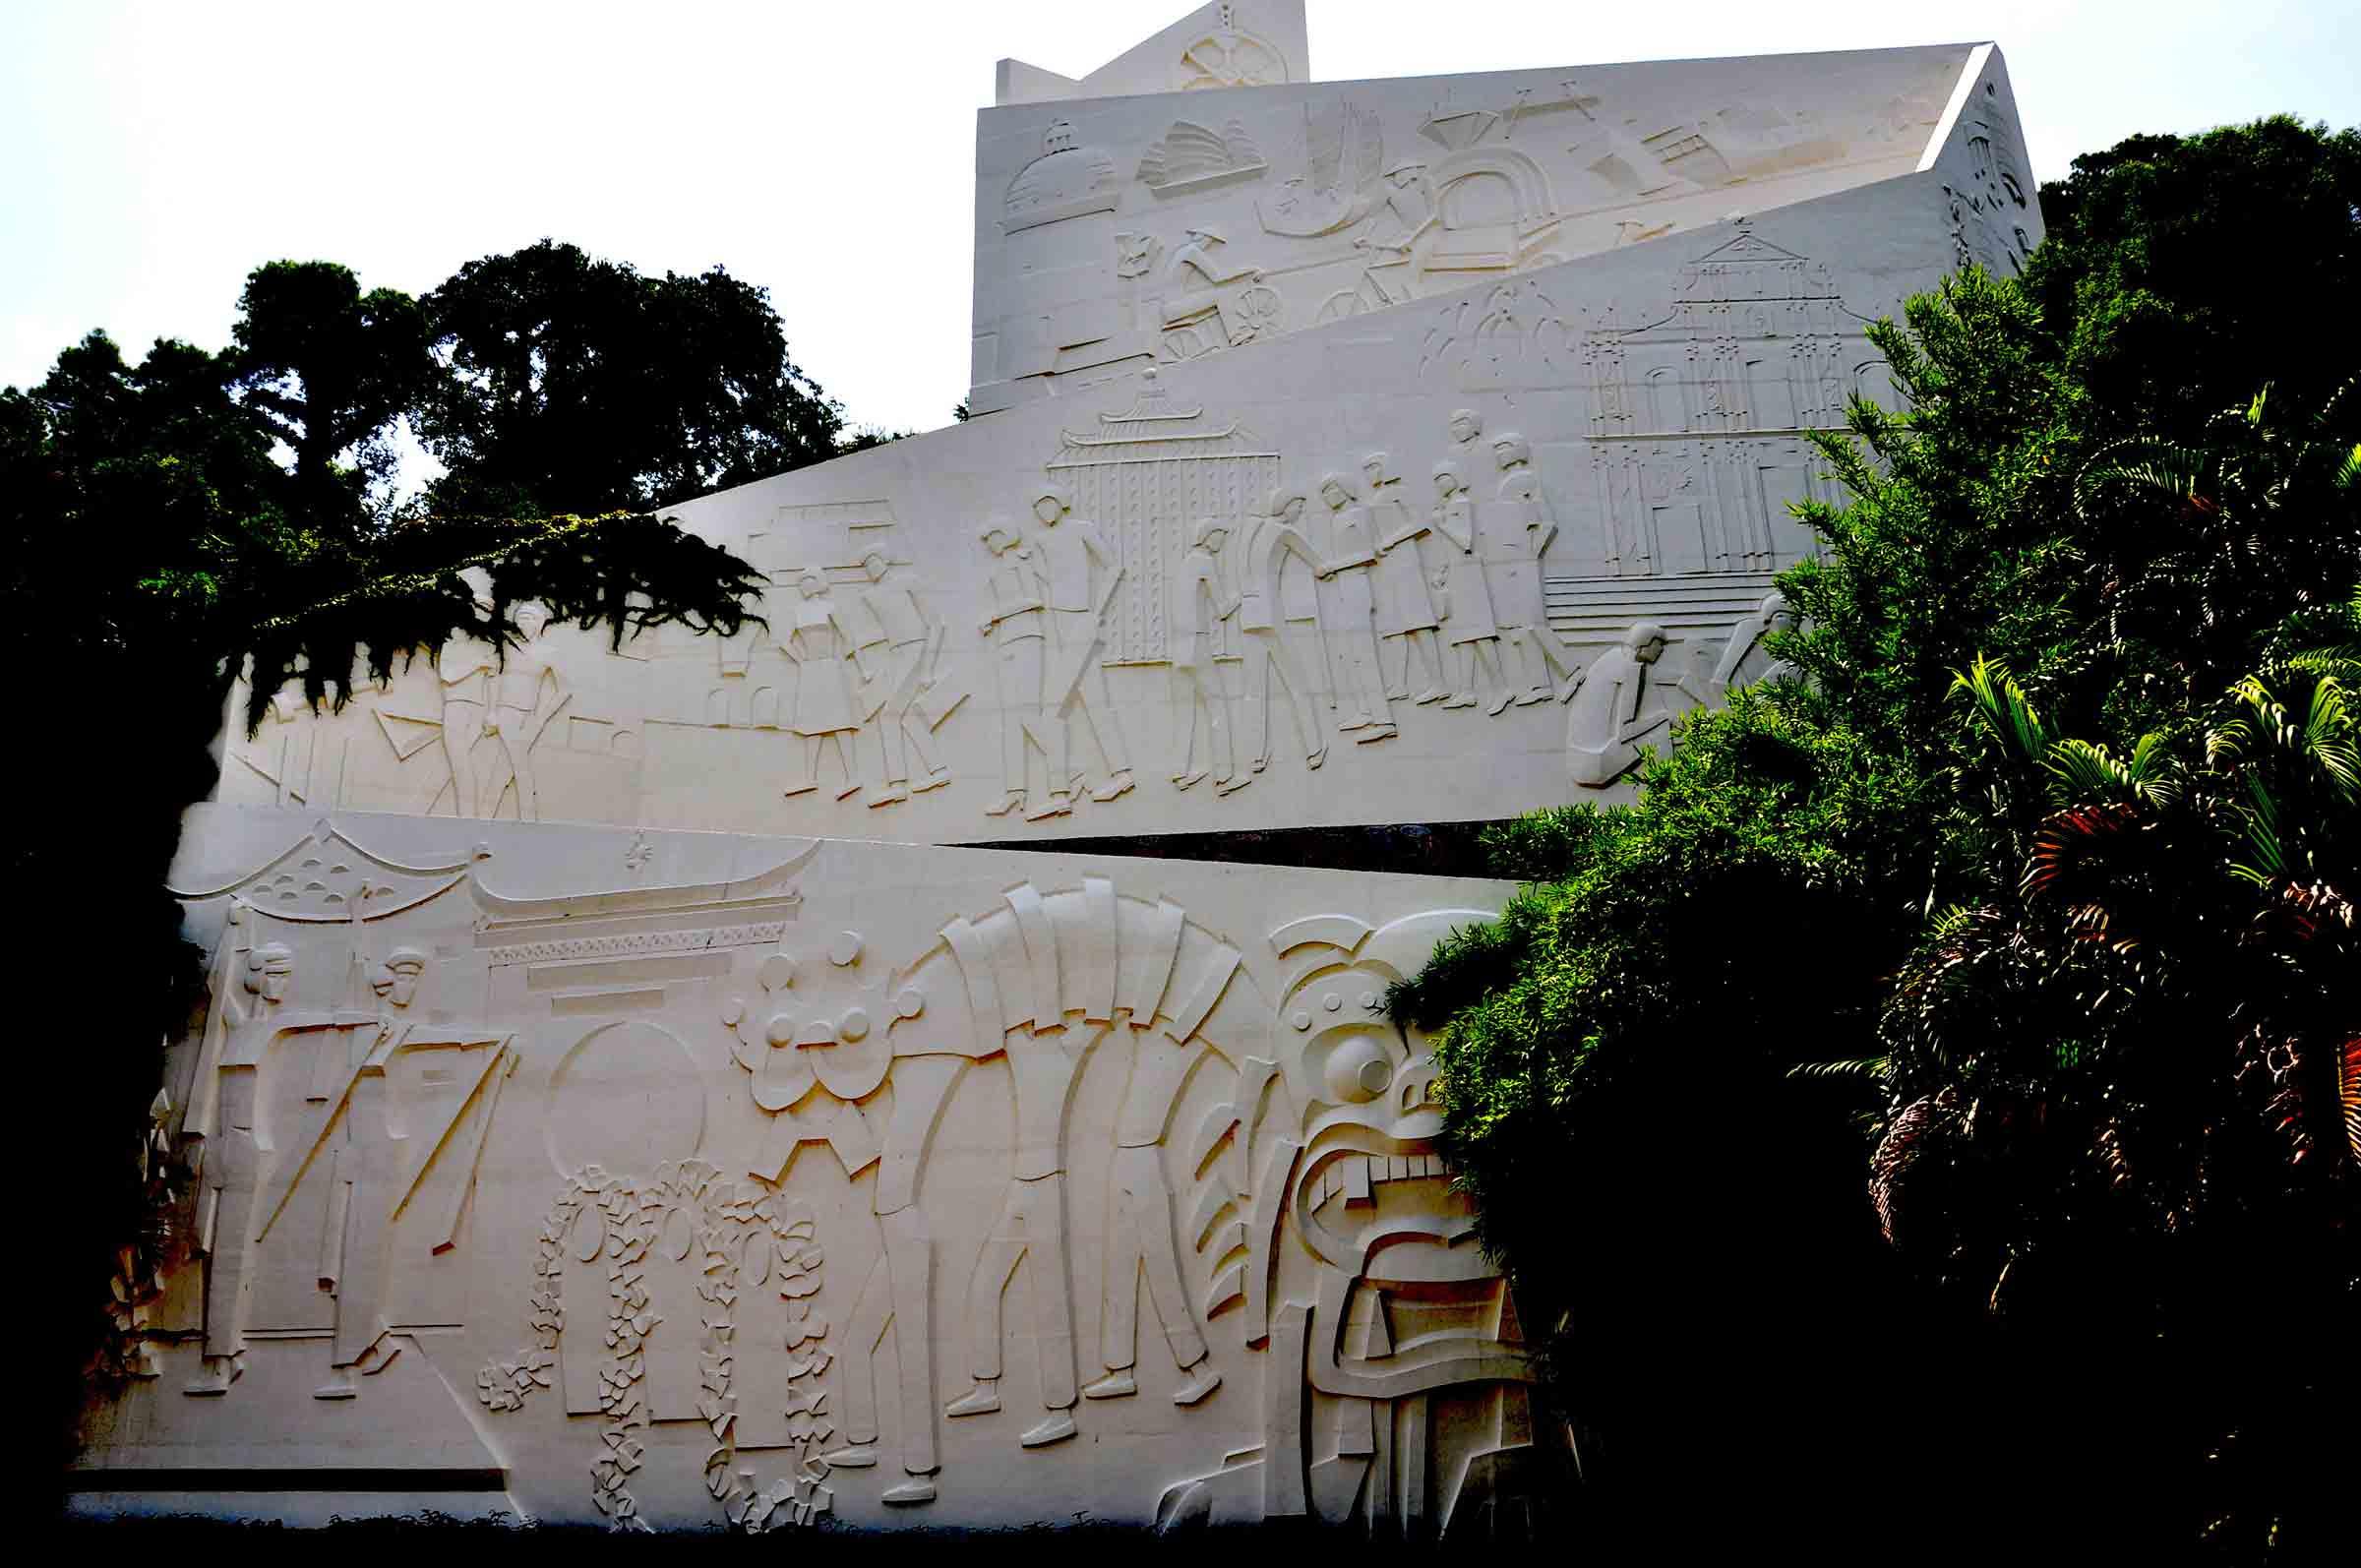 Taipa Pequena sculpture of Macanese life